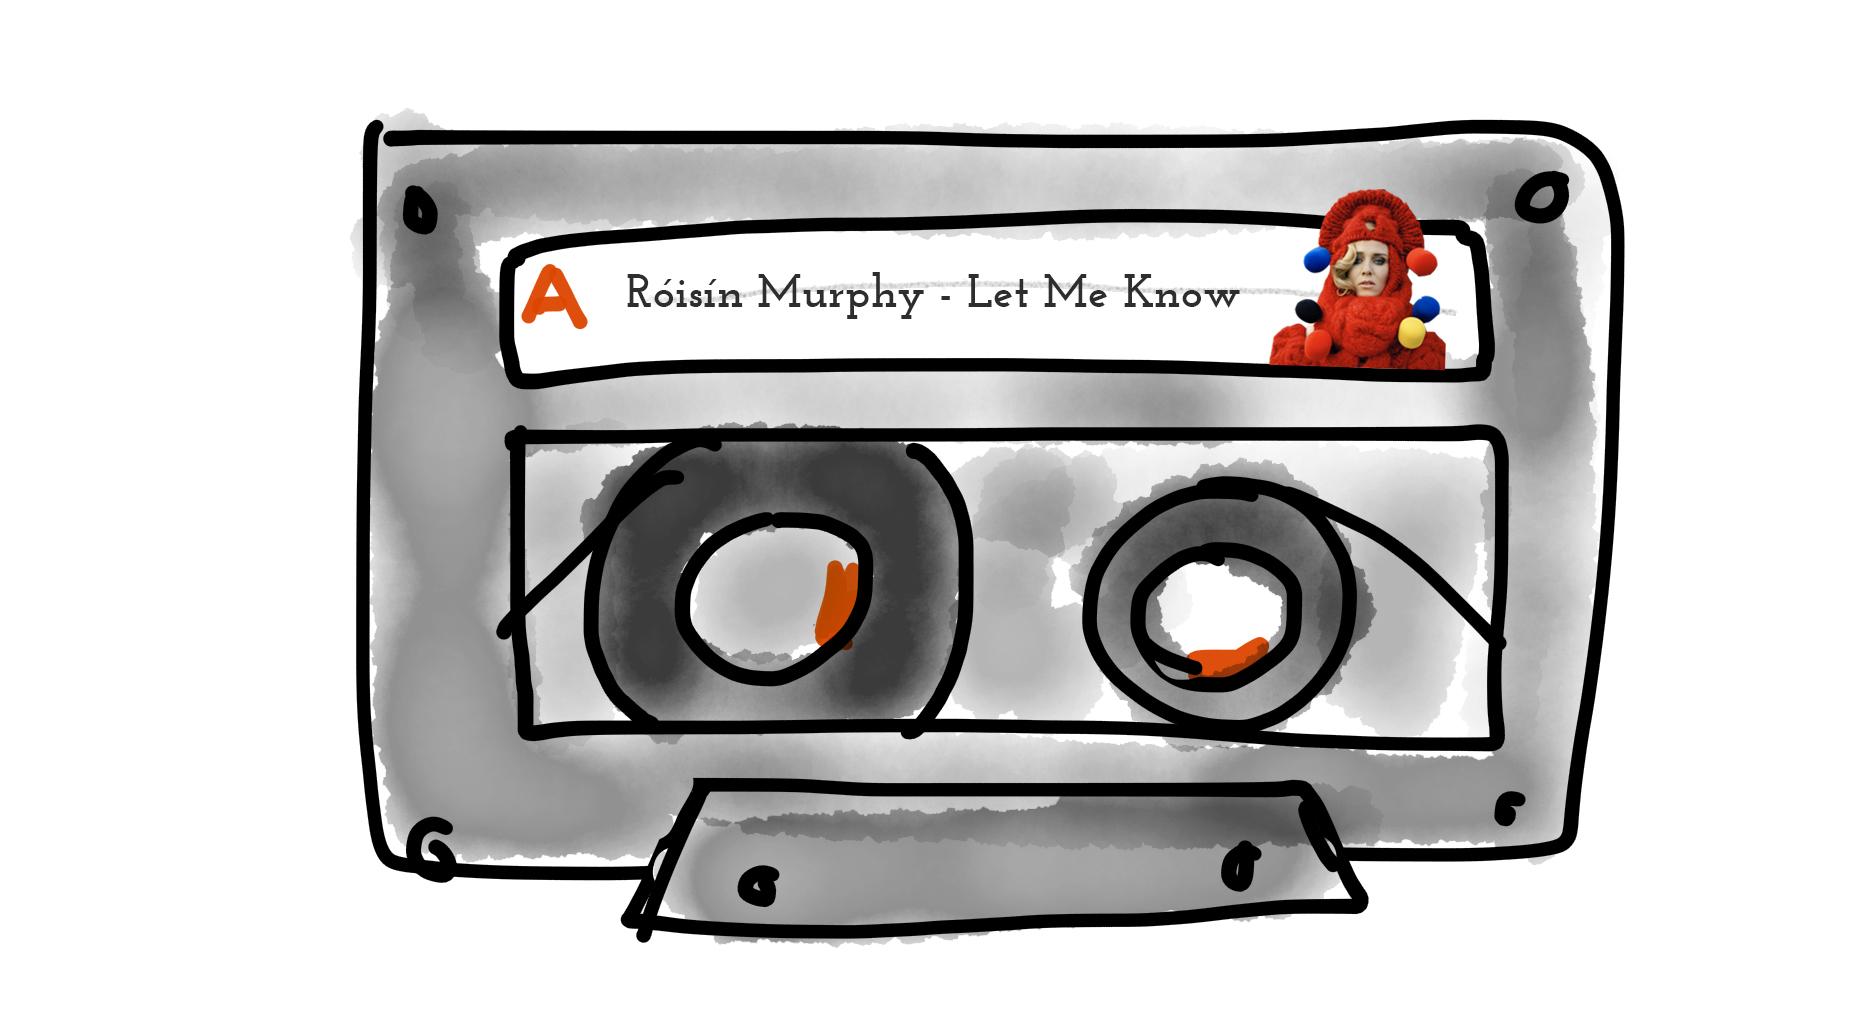 Róisín Murphy - Let Me Know